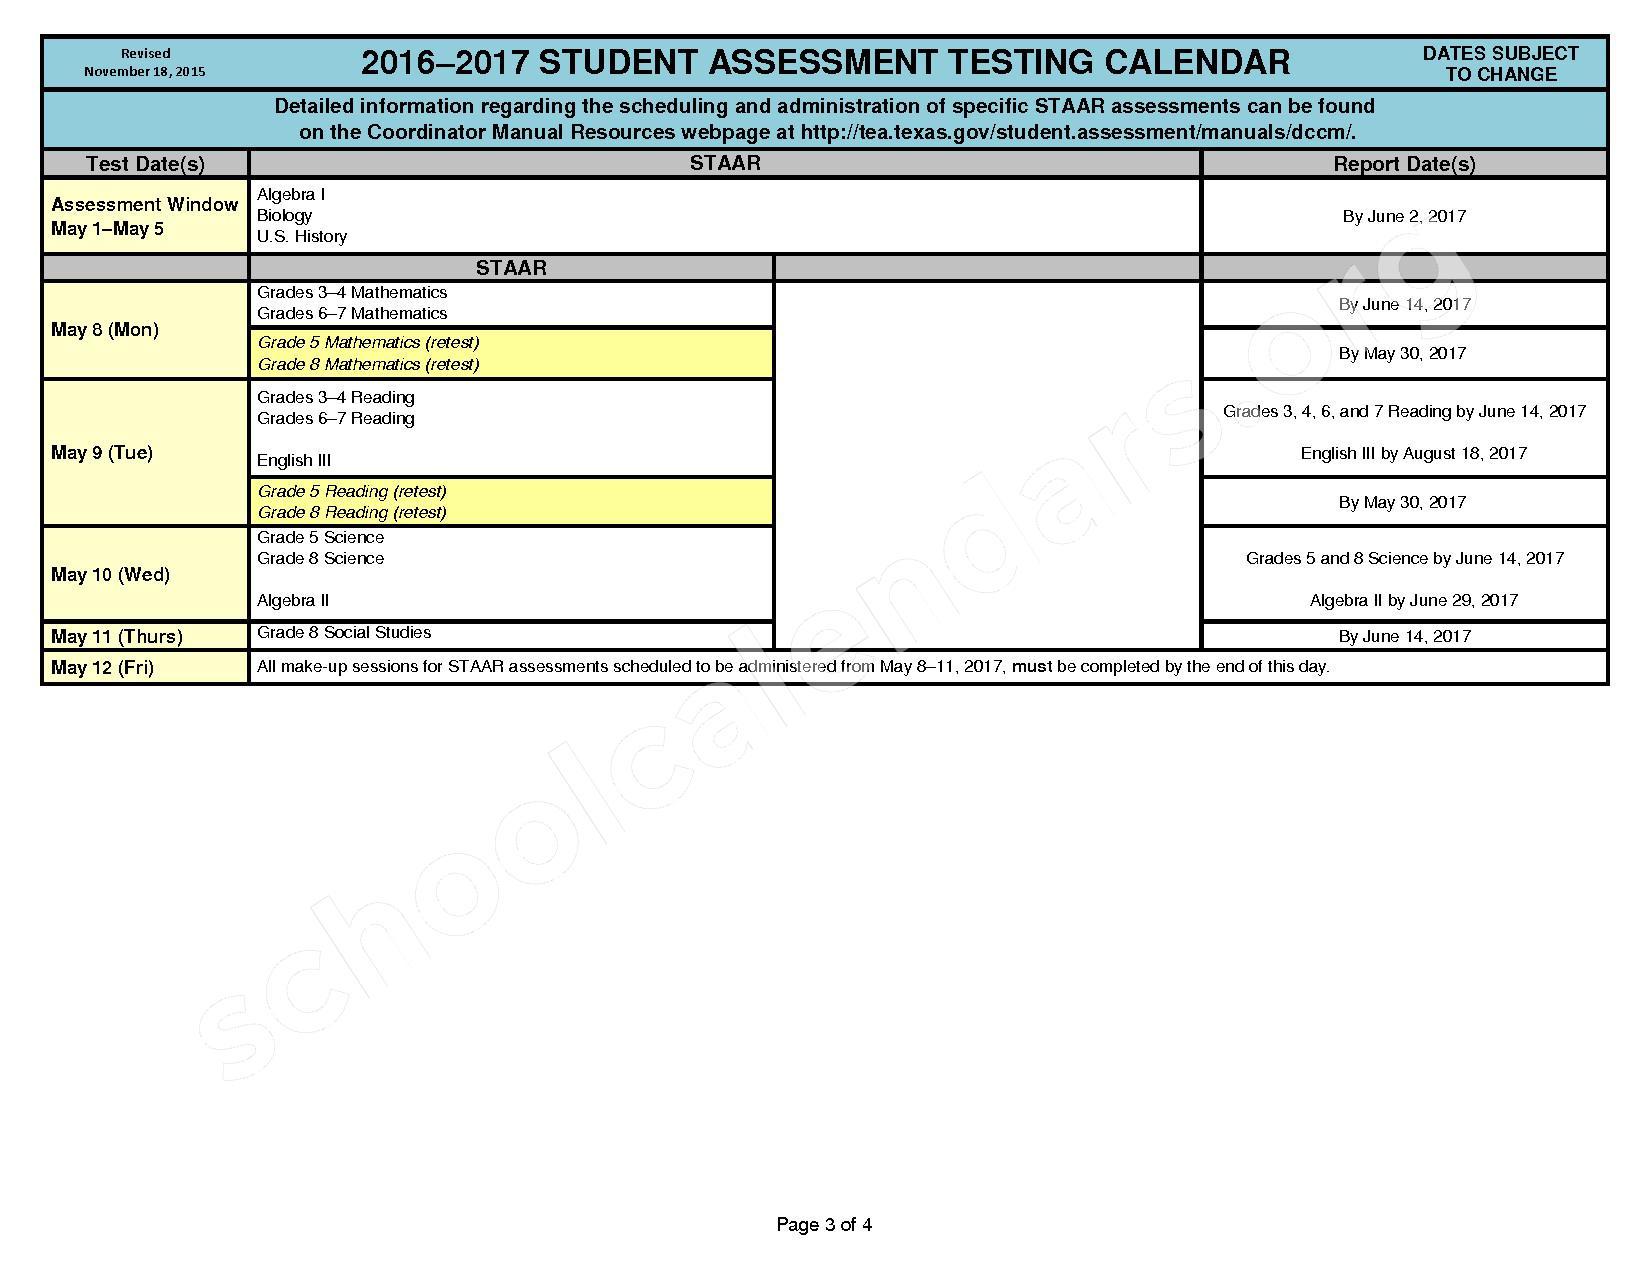 2016 - 2017 Student Assessment Calendar – Cleburne Independent School District – page 3